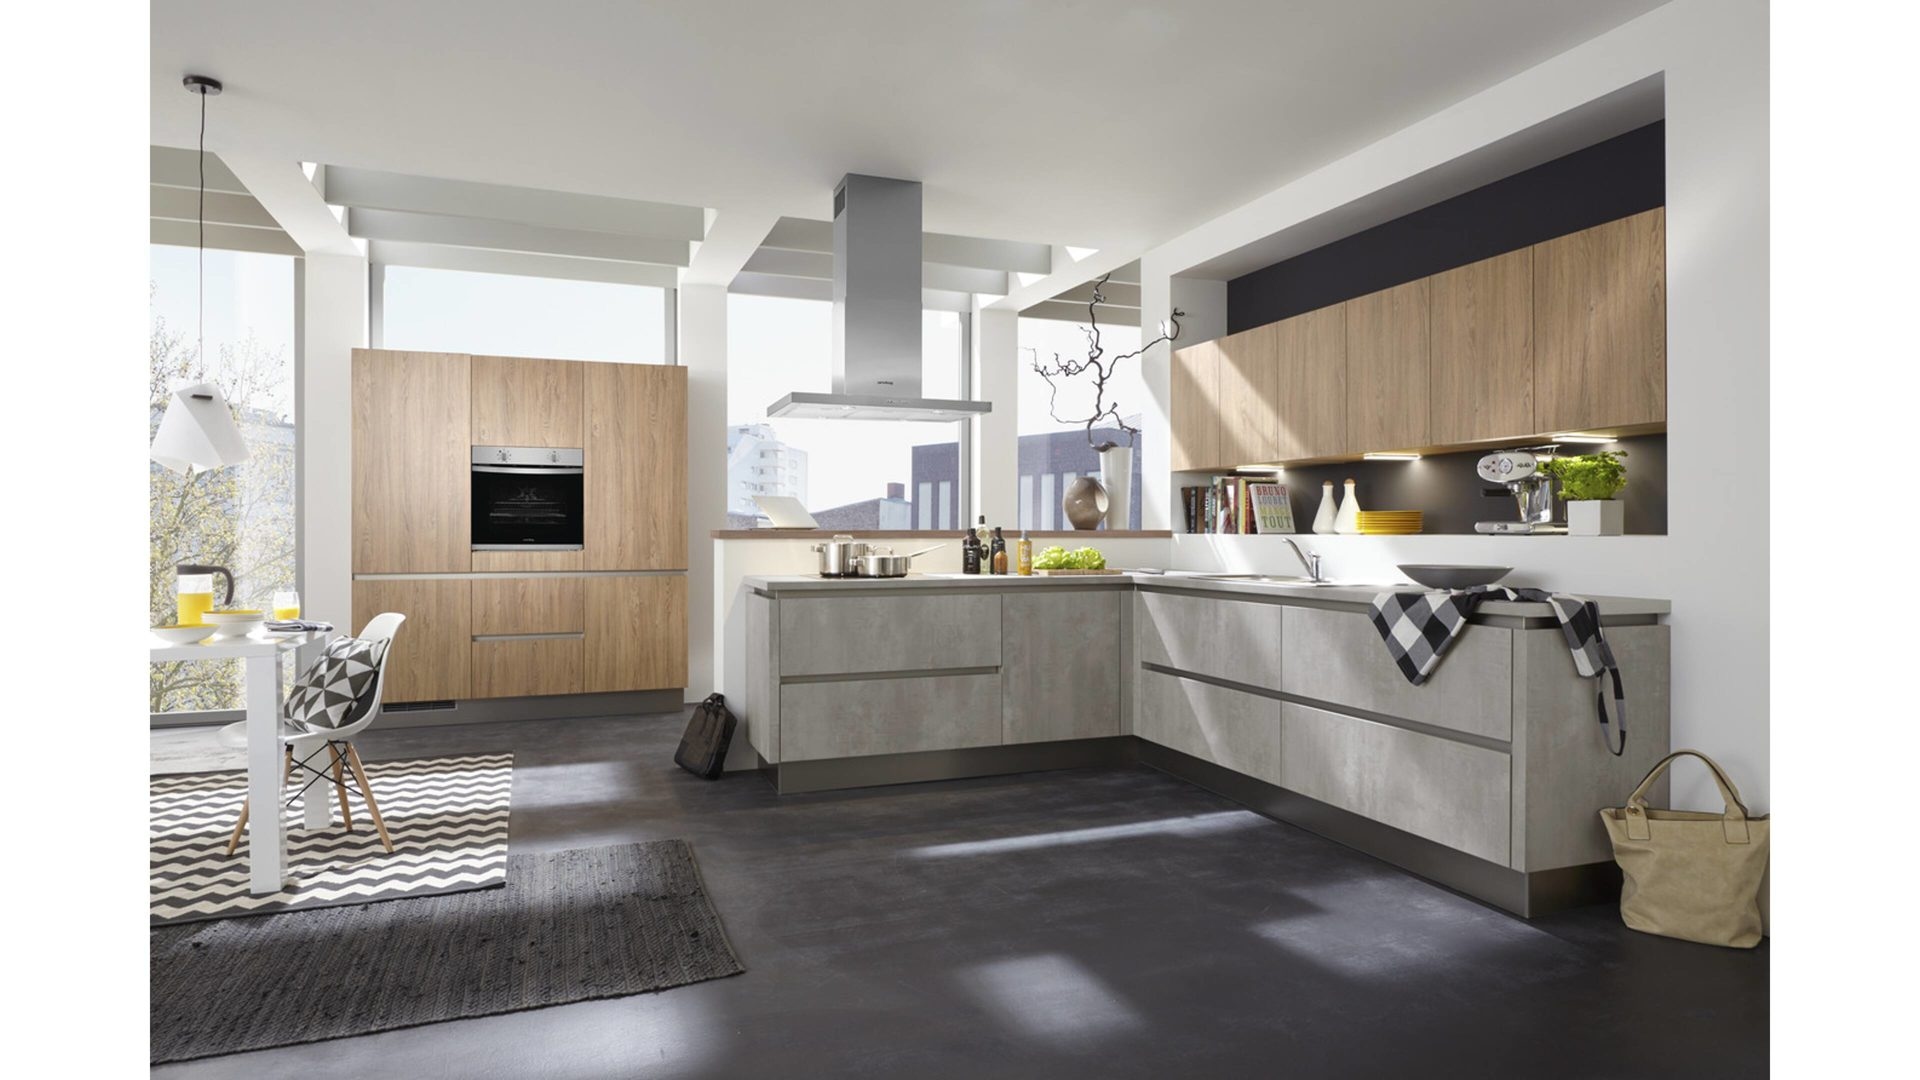 Möbel Boer Coesfeld, Culineo Küche mit privileg ...